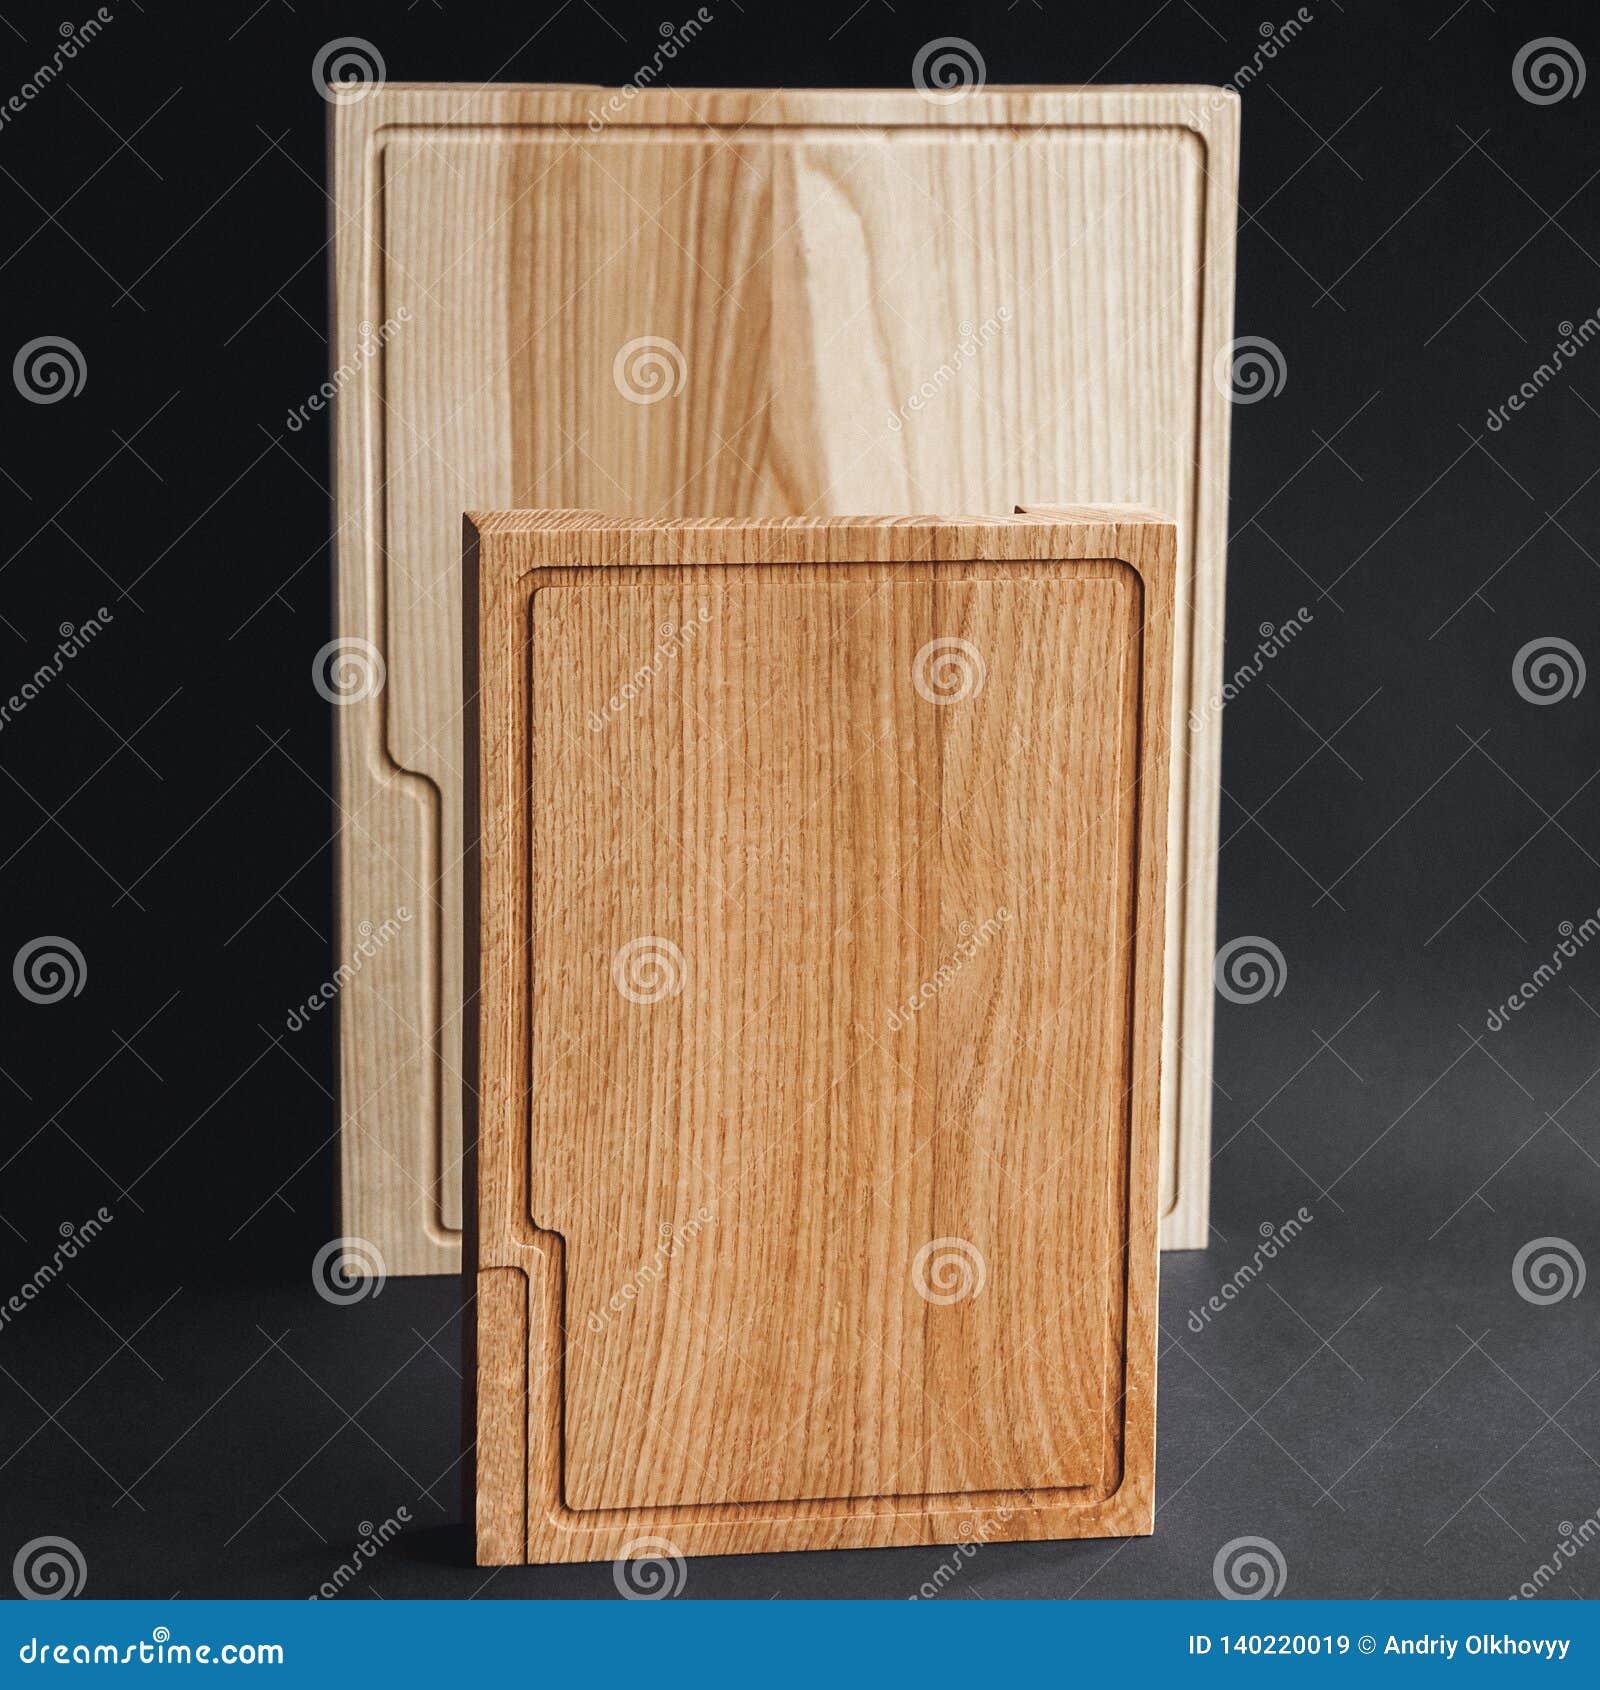 Walnut handmade wood cutting board on black wooden board